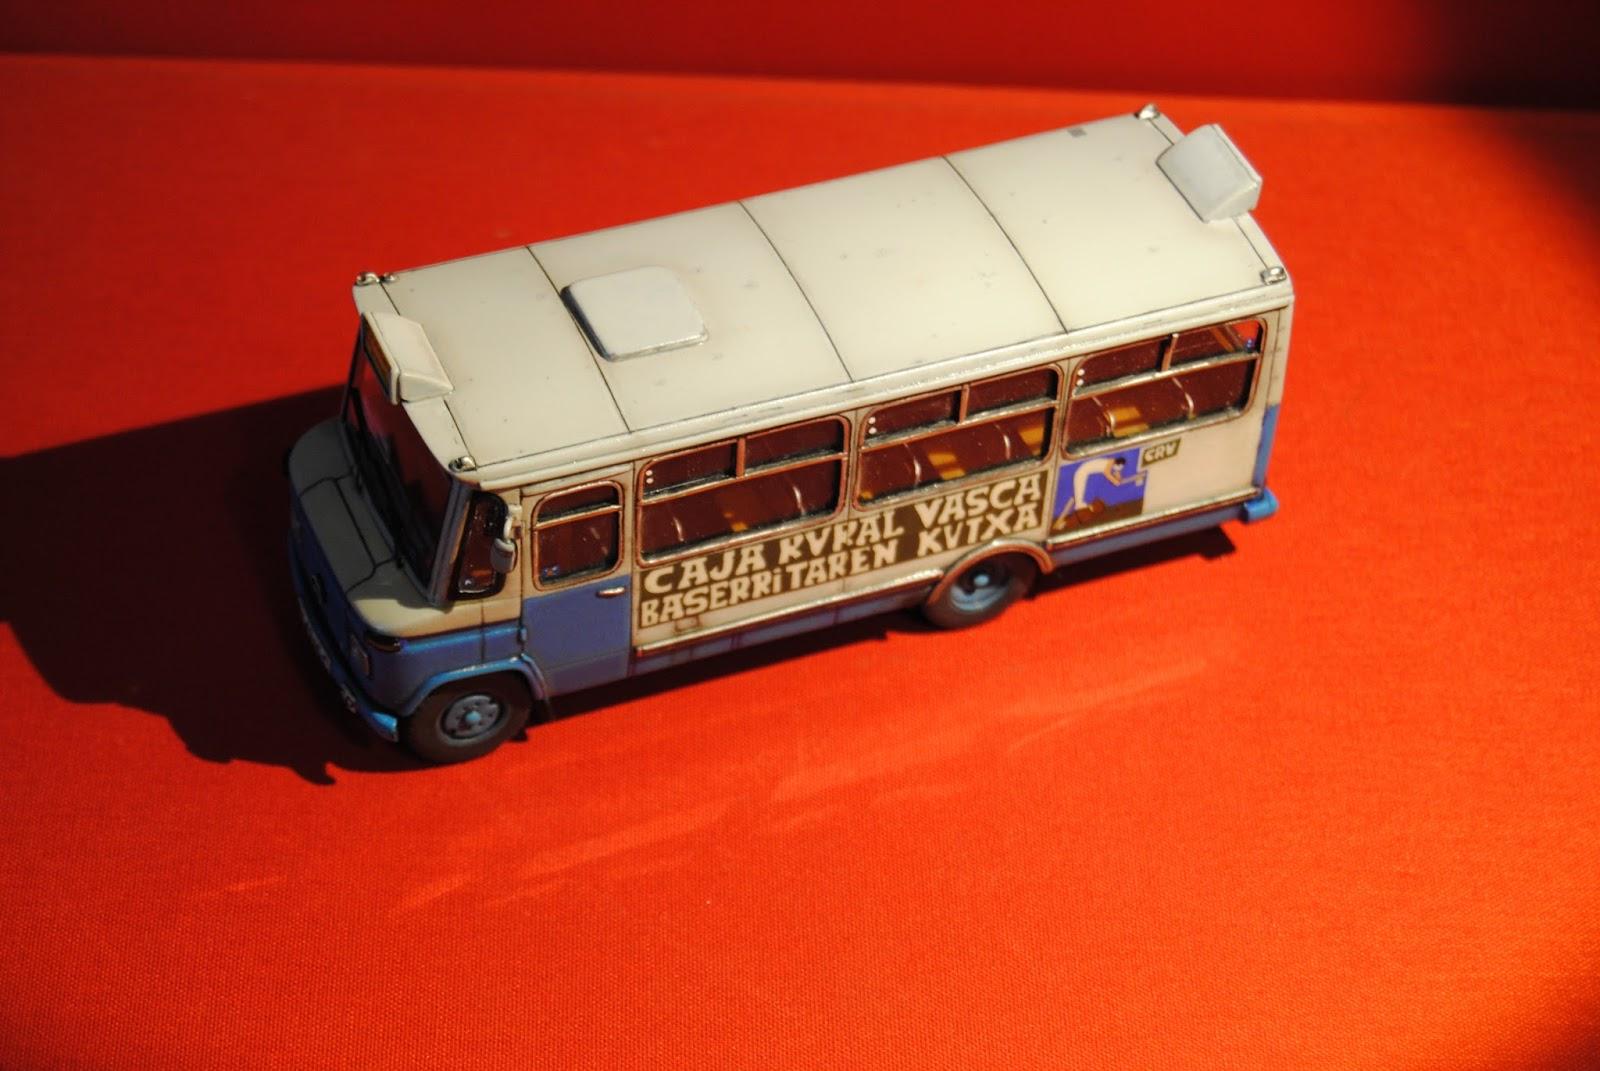 Modelautoclassic azulito bilbao caja rural vasca 1 43 scratch for Caja rural bilbao oficinas